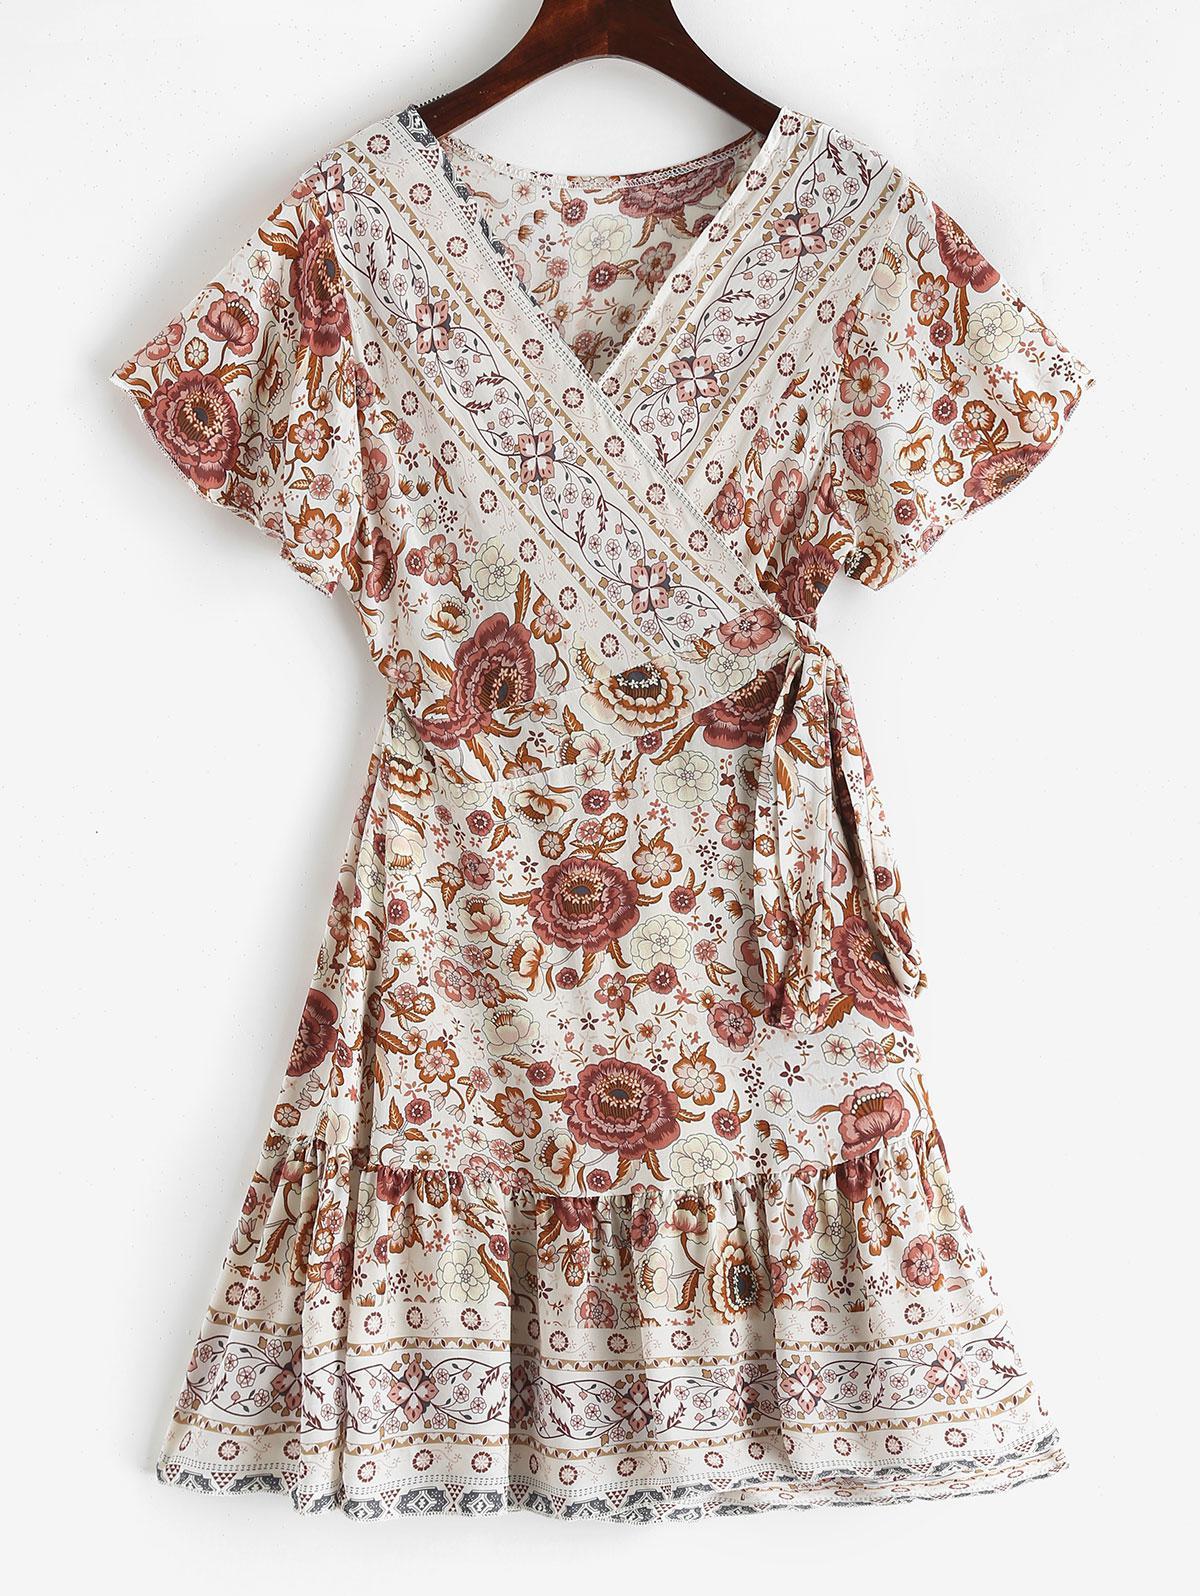 V Neck Ruffles Floral Print Wrap Dress, Lipstick pink